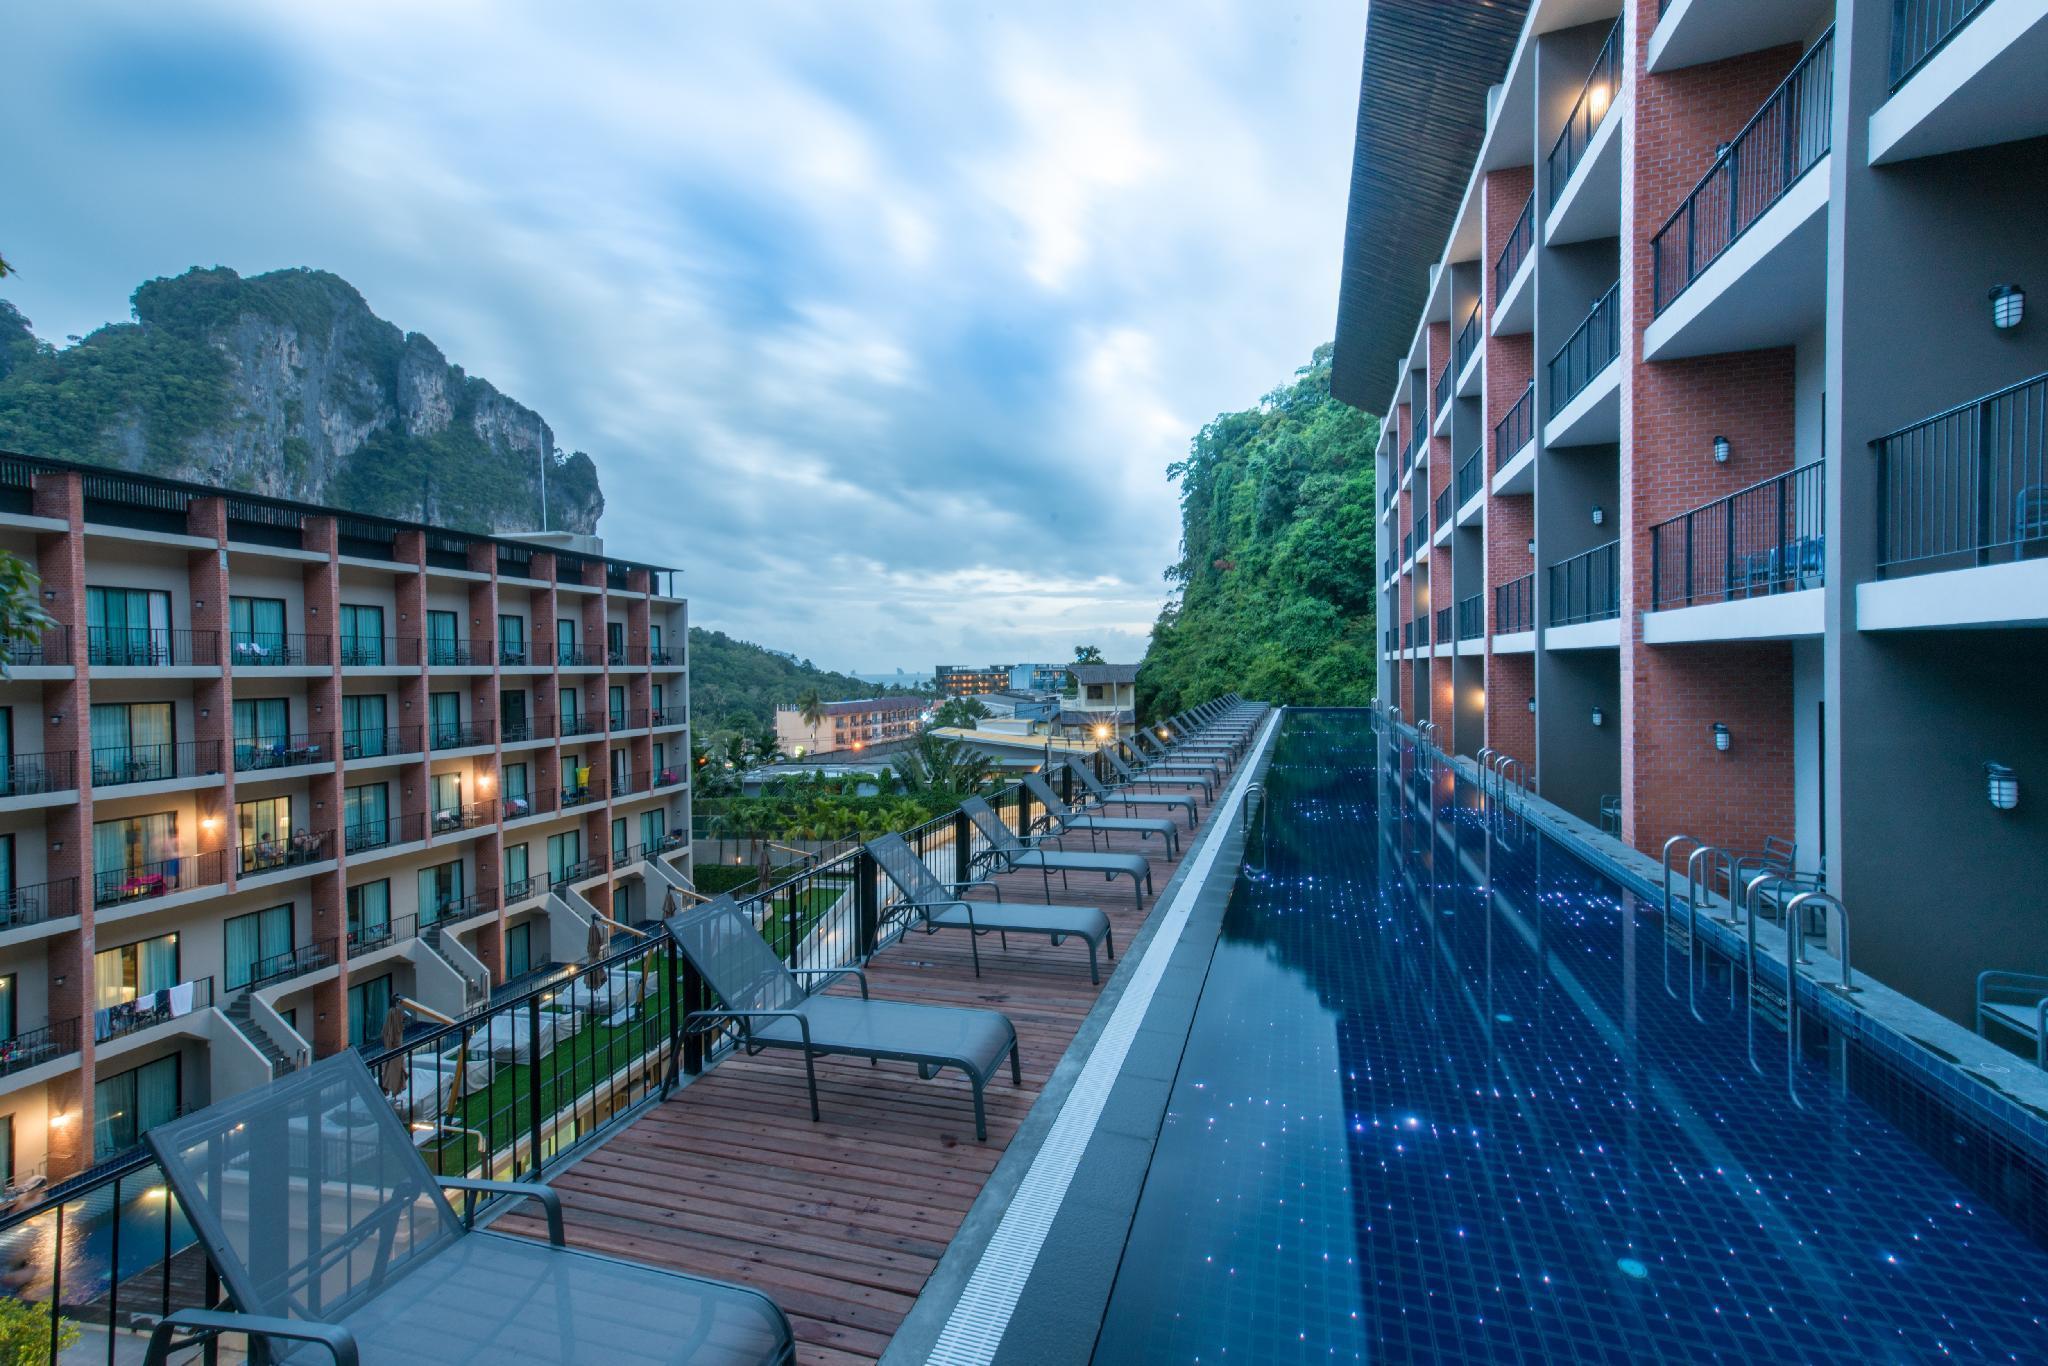 Sugar Marina Resort-CLIFFHANGER-Aonang ชูการ์ มารีน่า รีสอร์ท คลิฟแฮงเกอร์ อ่าวนาง